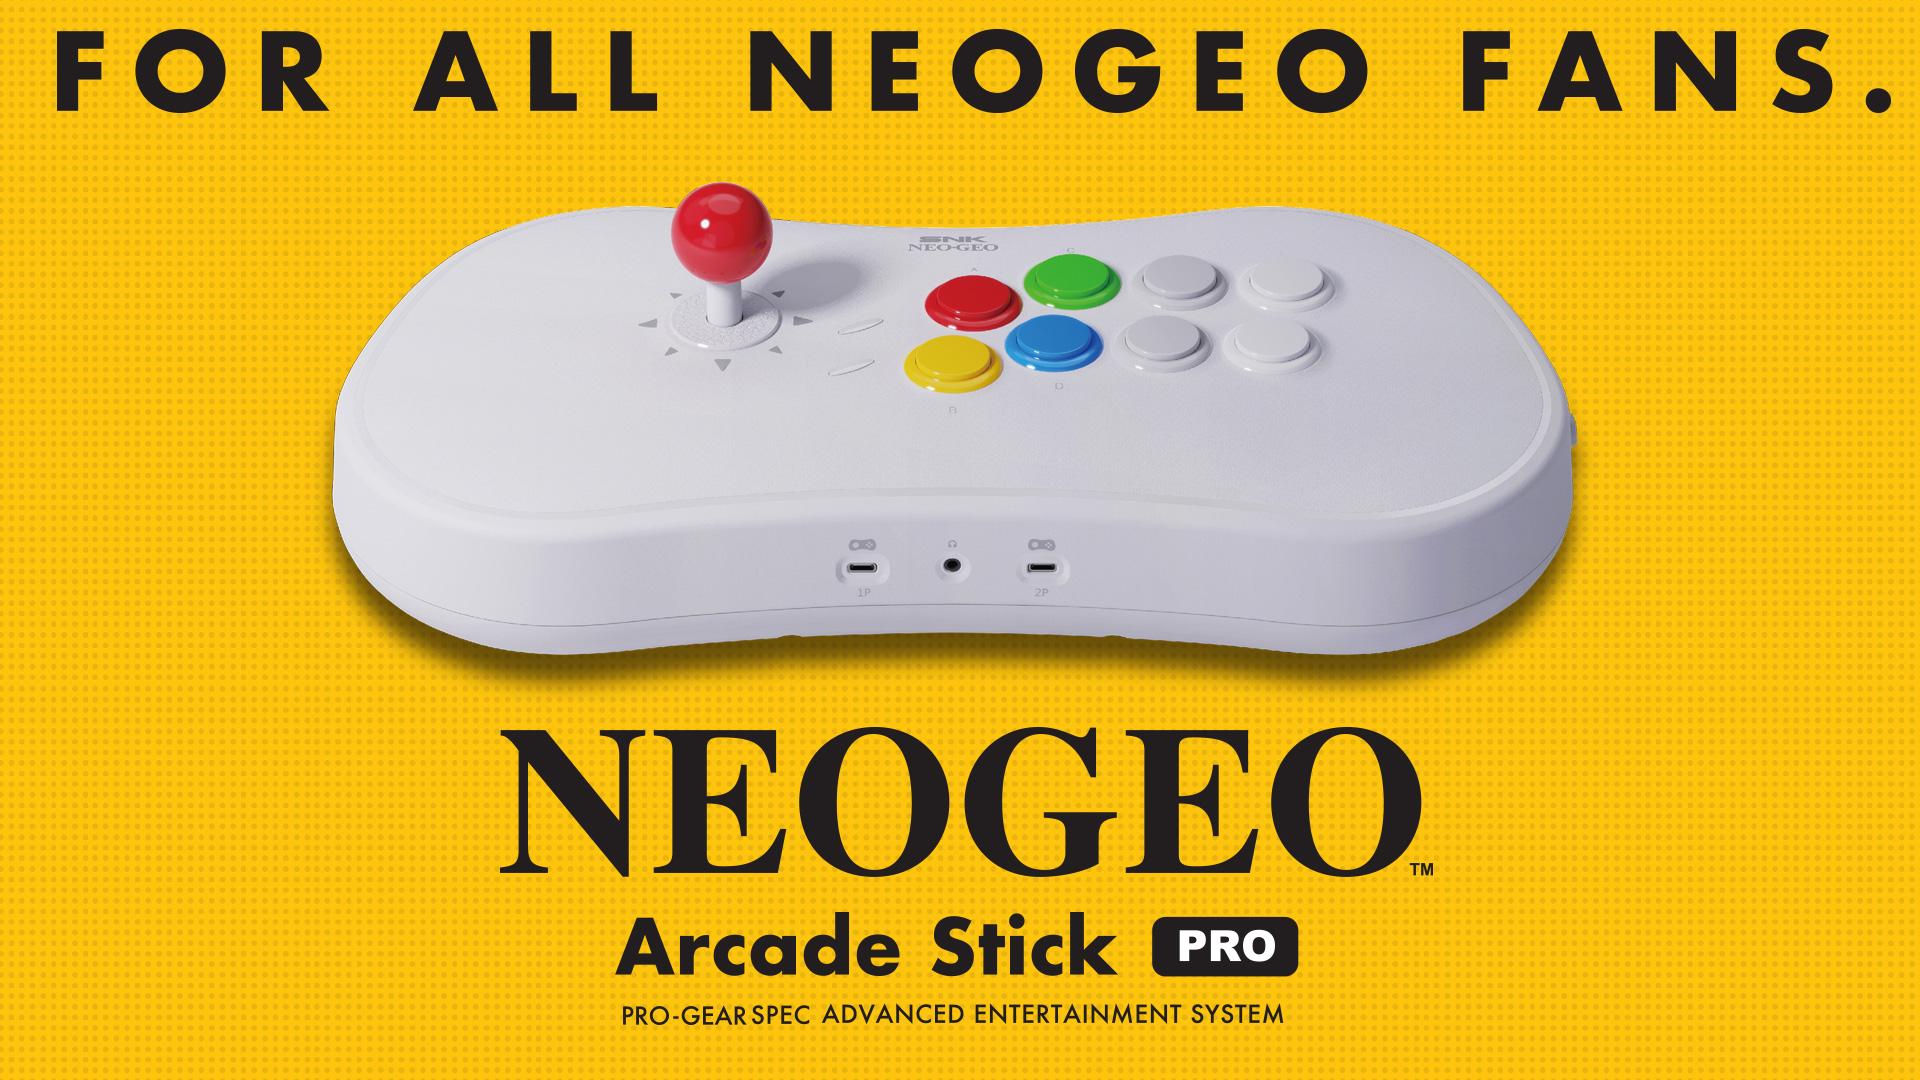 NEOGEO Arcade Stick Pro Updates Are Here!